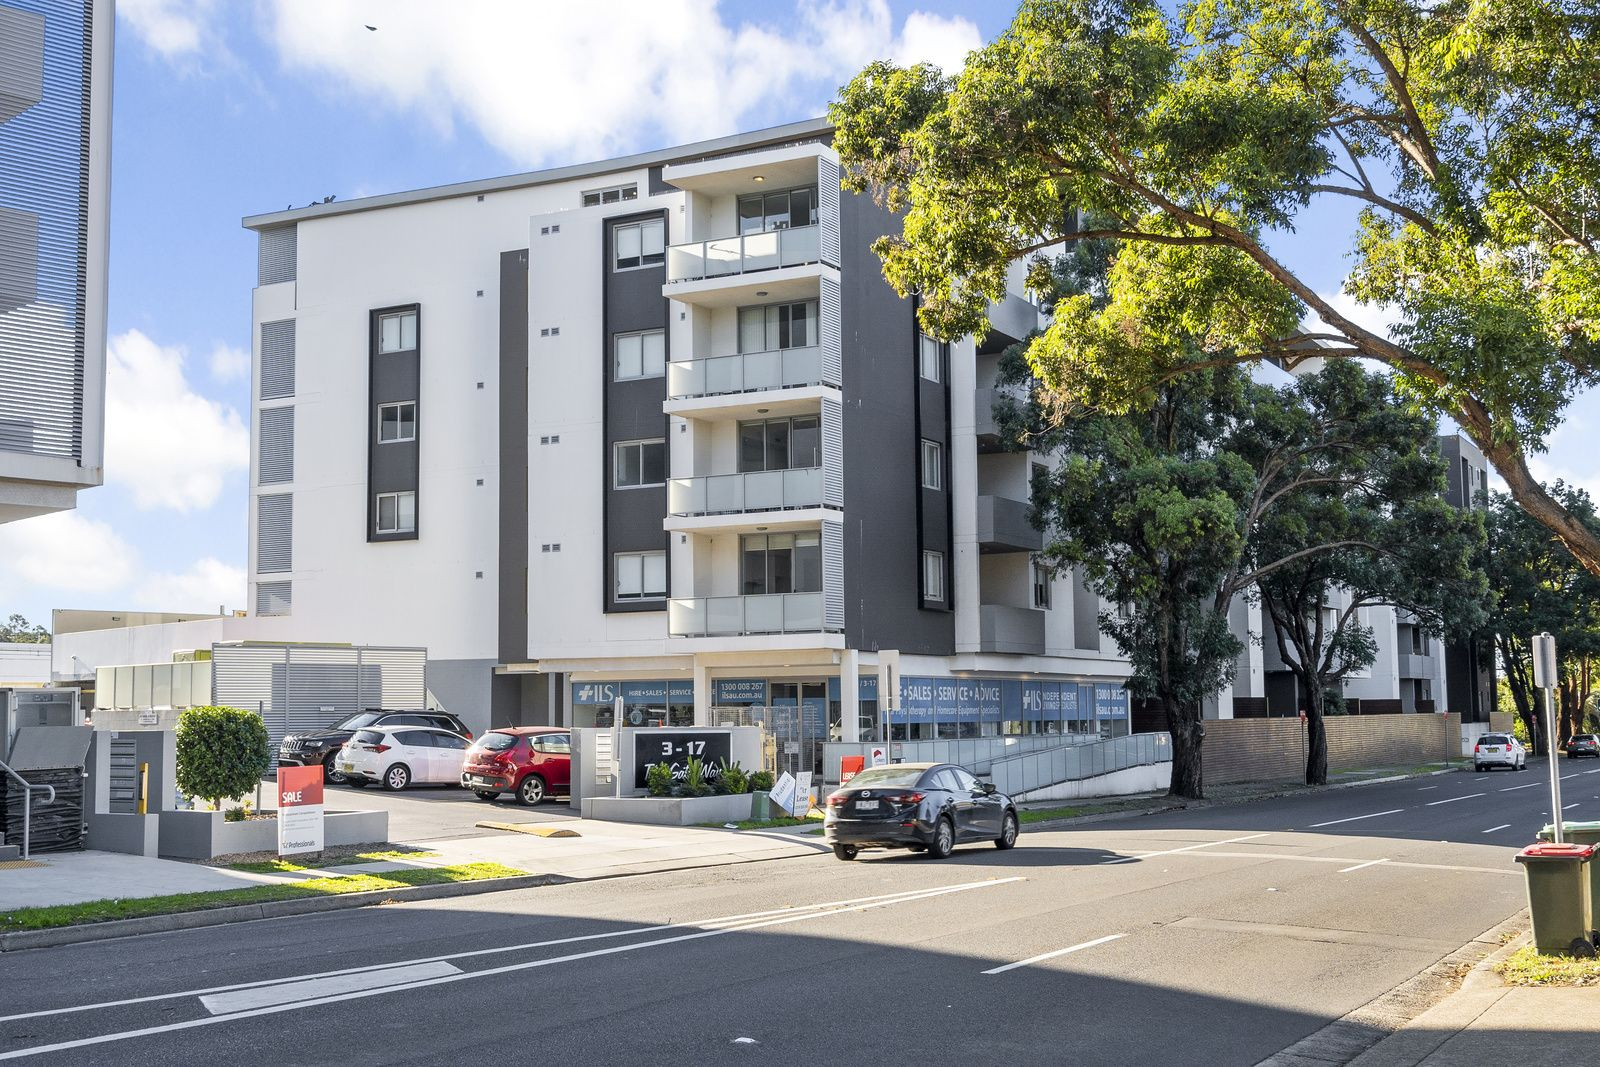 90/3-17 Queen St, Campbelltown NSW 2560, Image 0